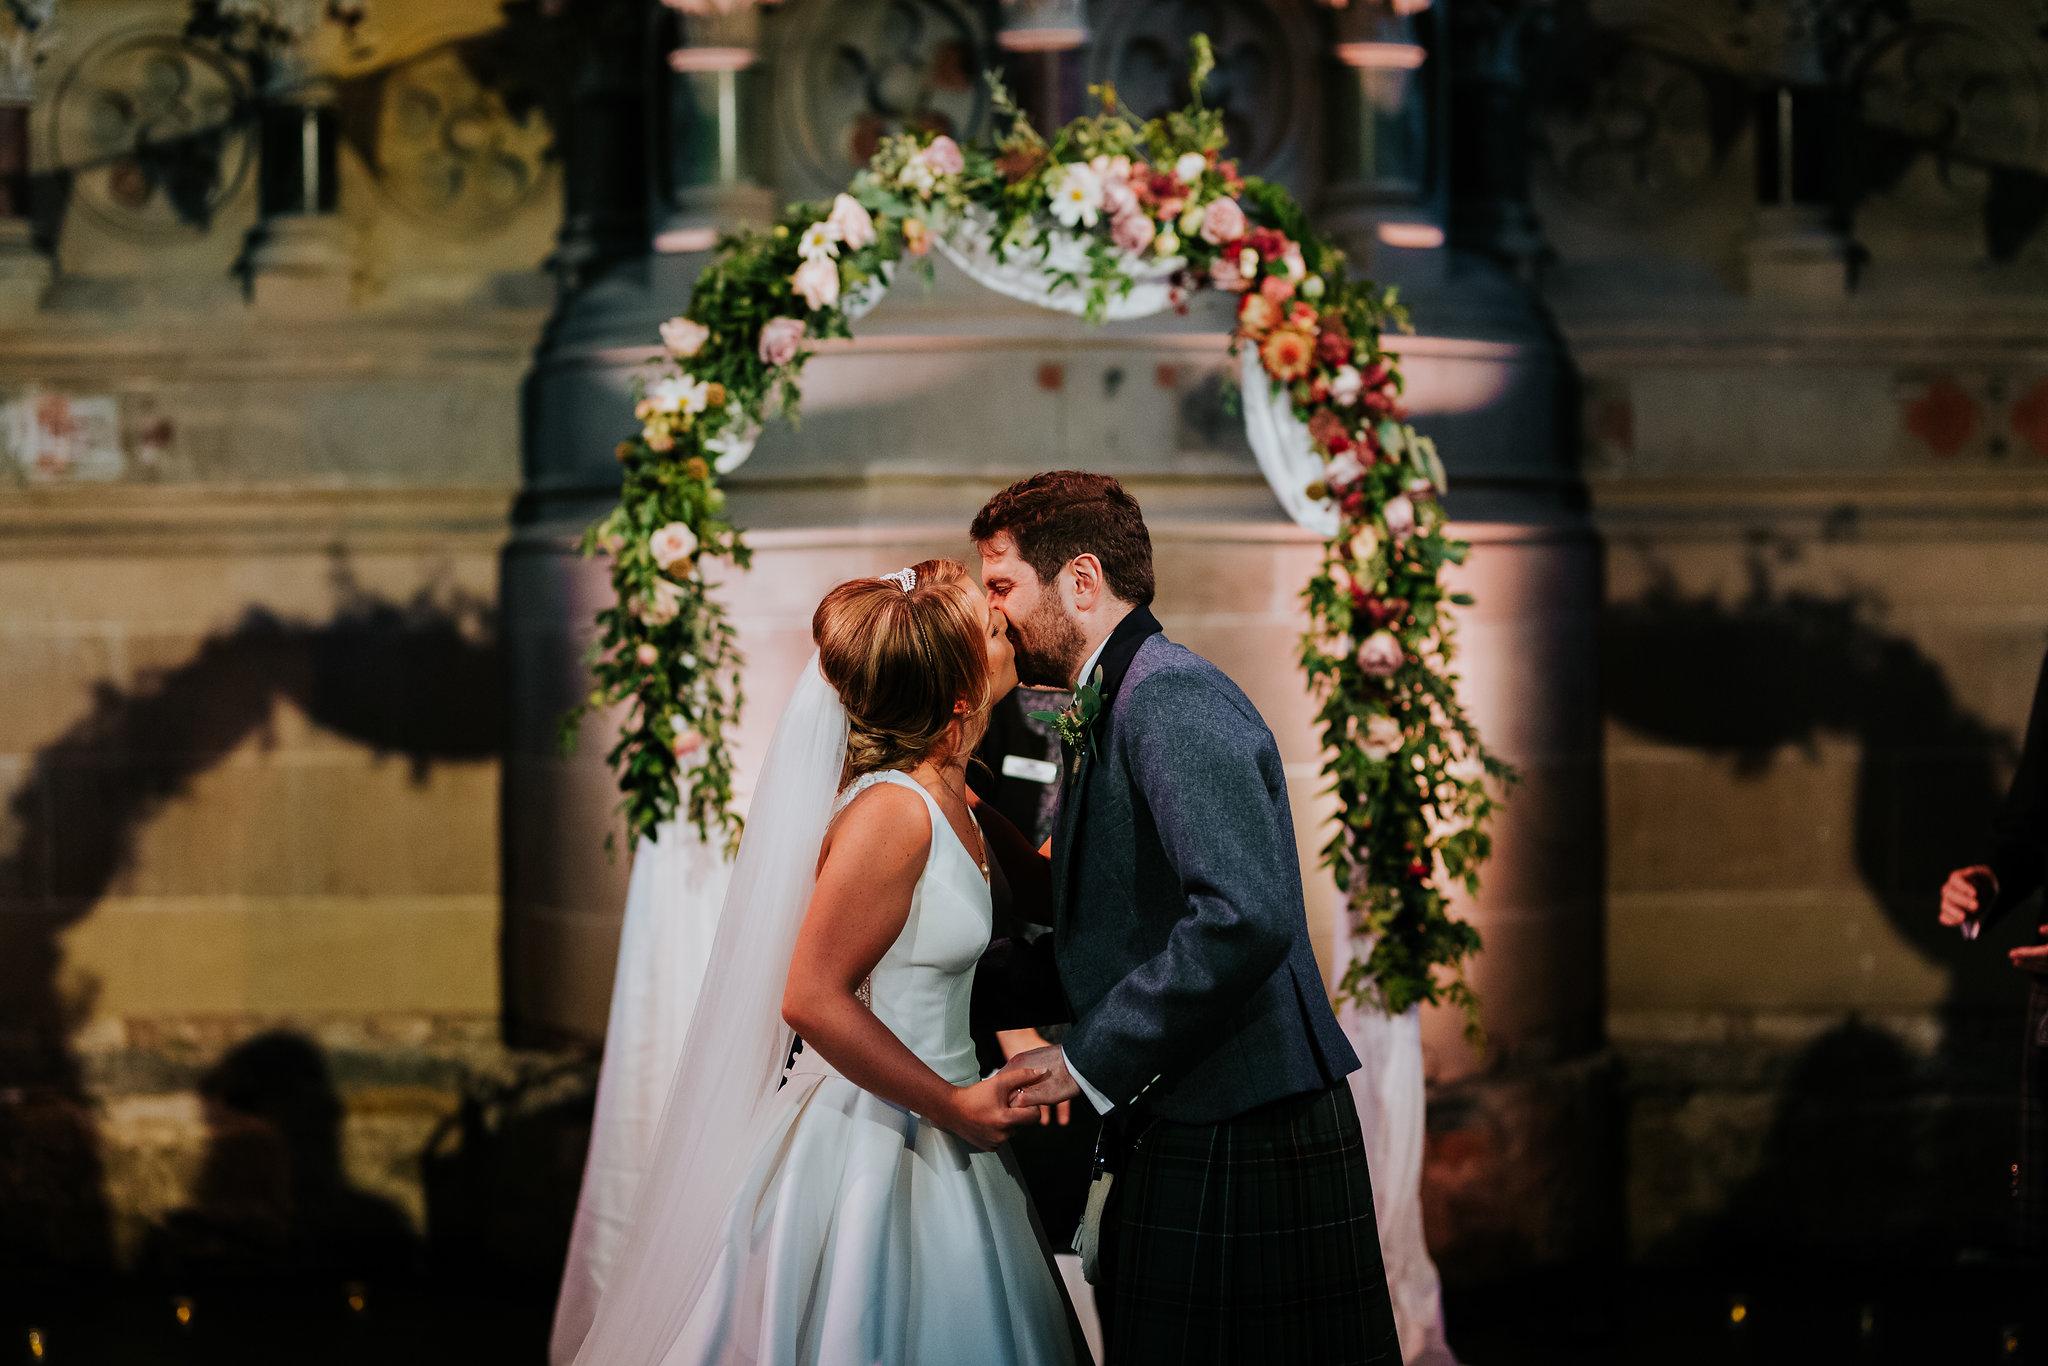 Cottiers wedding lavender and rose wedding florists scotland9.jpg